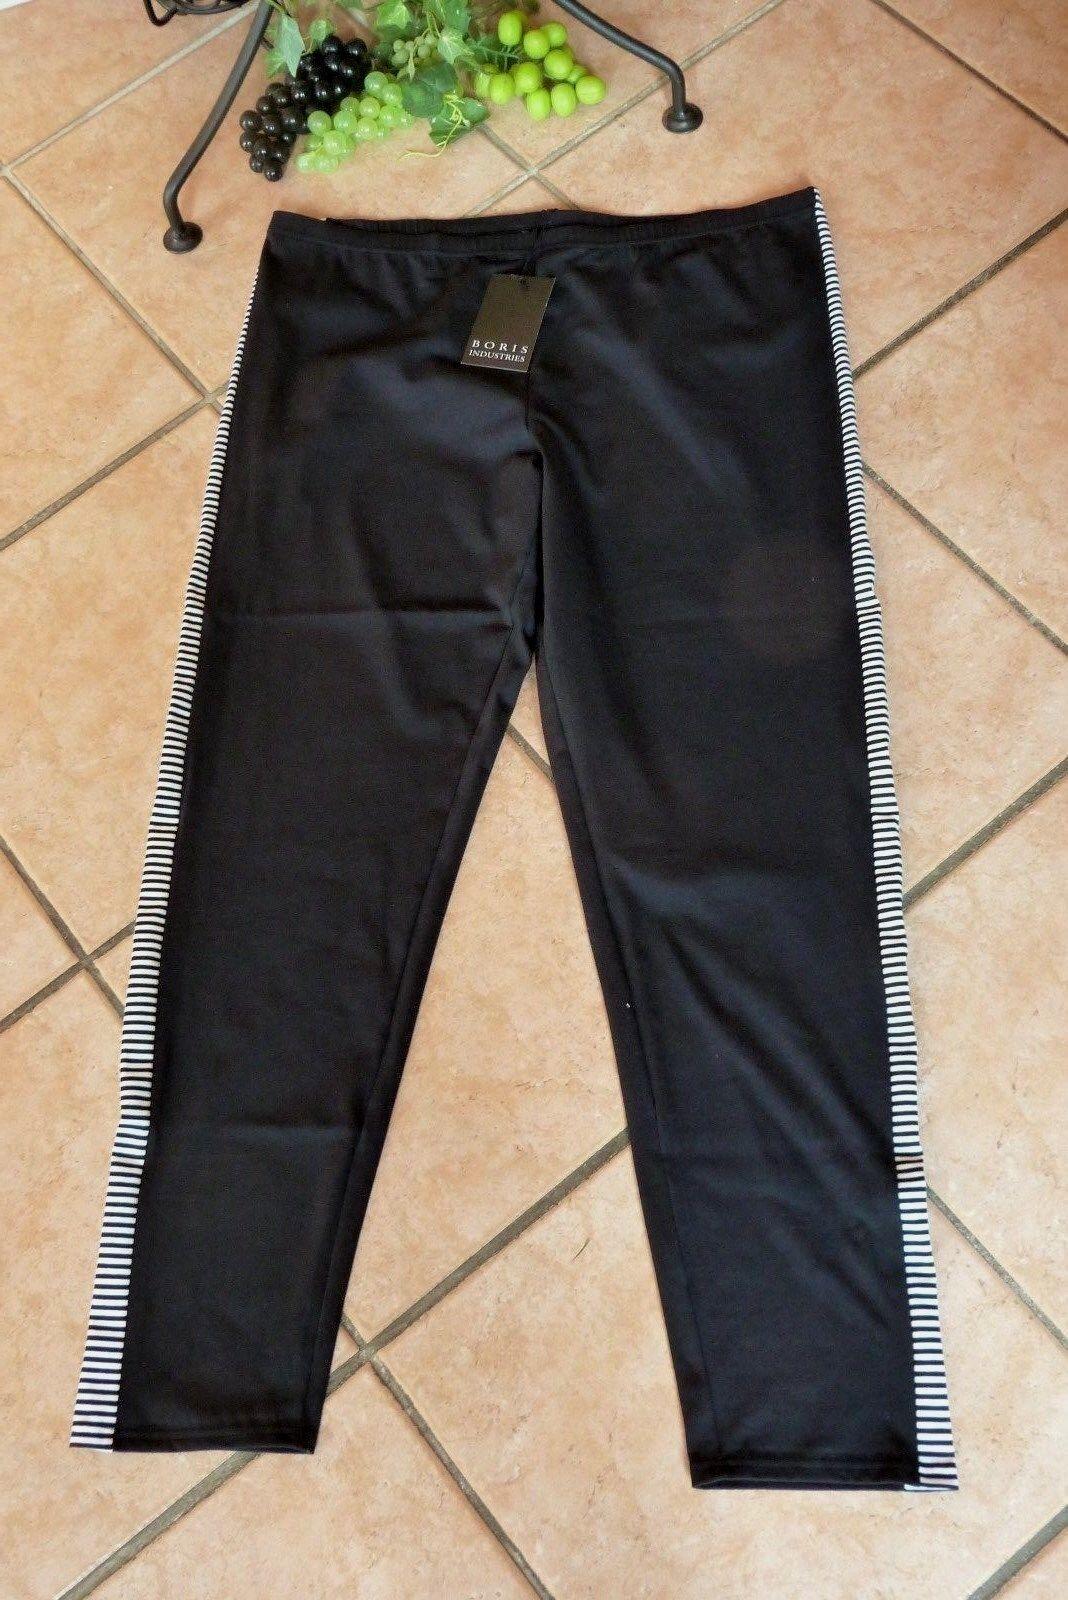 BORIS INDUSTRIES Leggings 50 52 (5) NEU black white Stretch Baumwolle LAGENLOOK